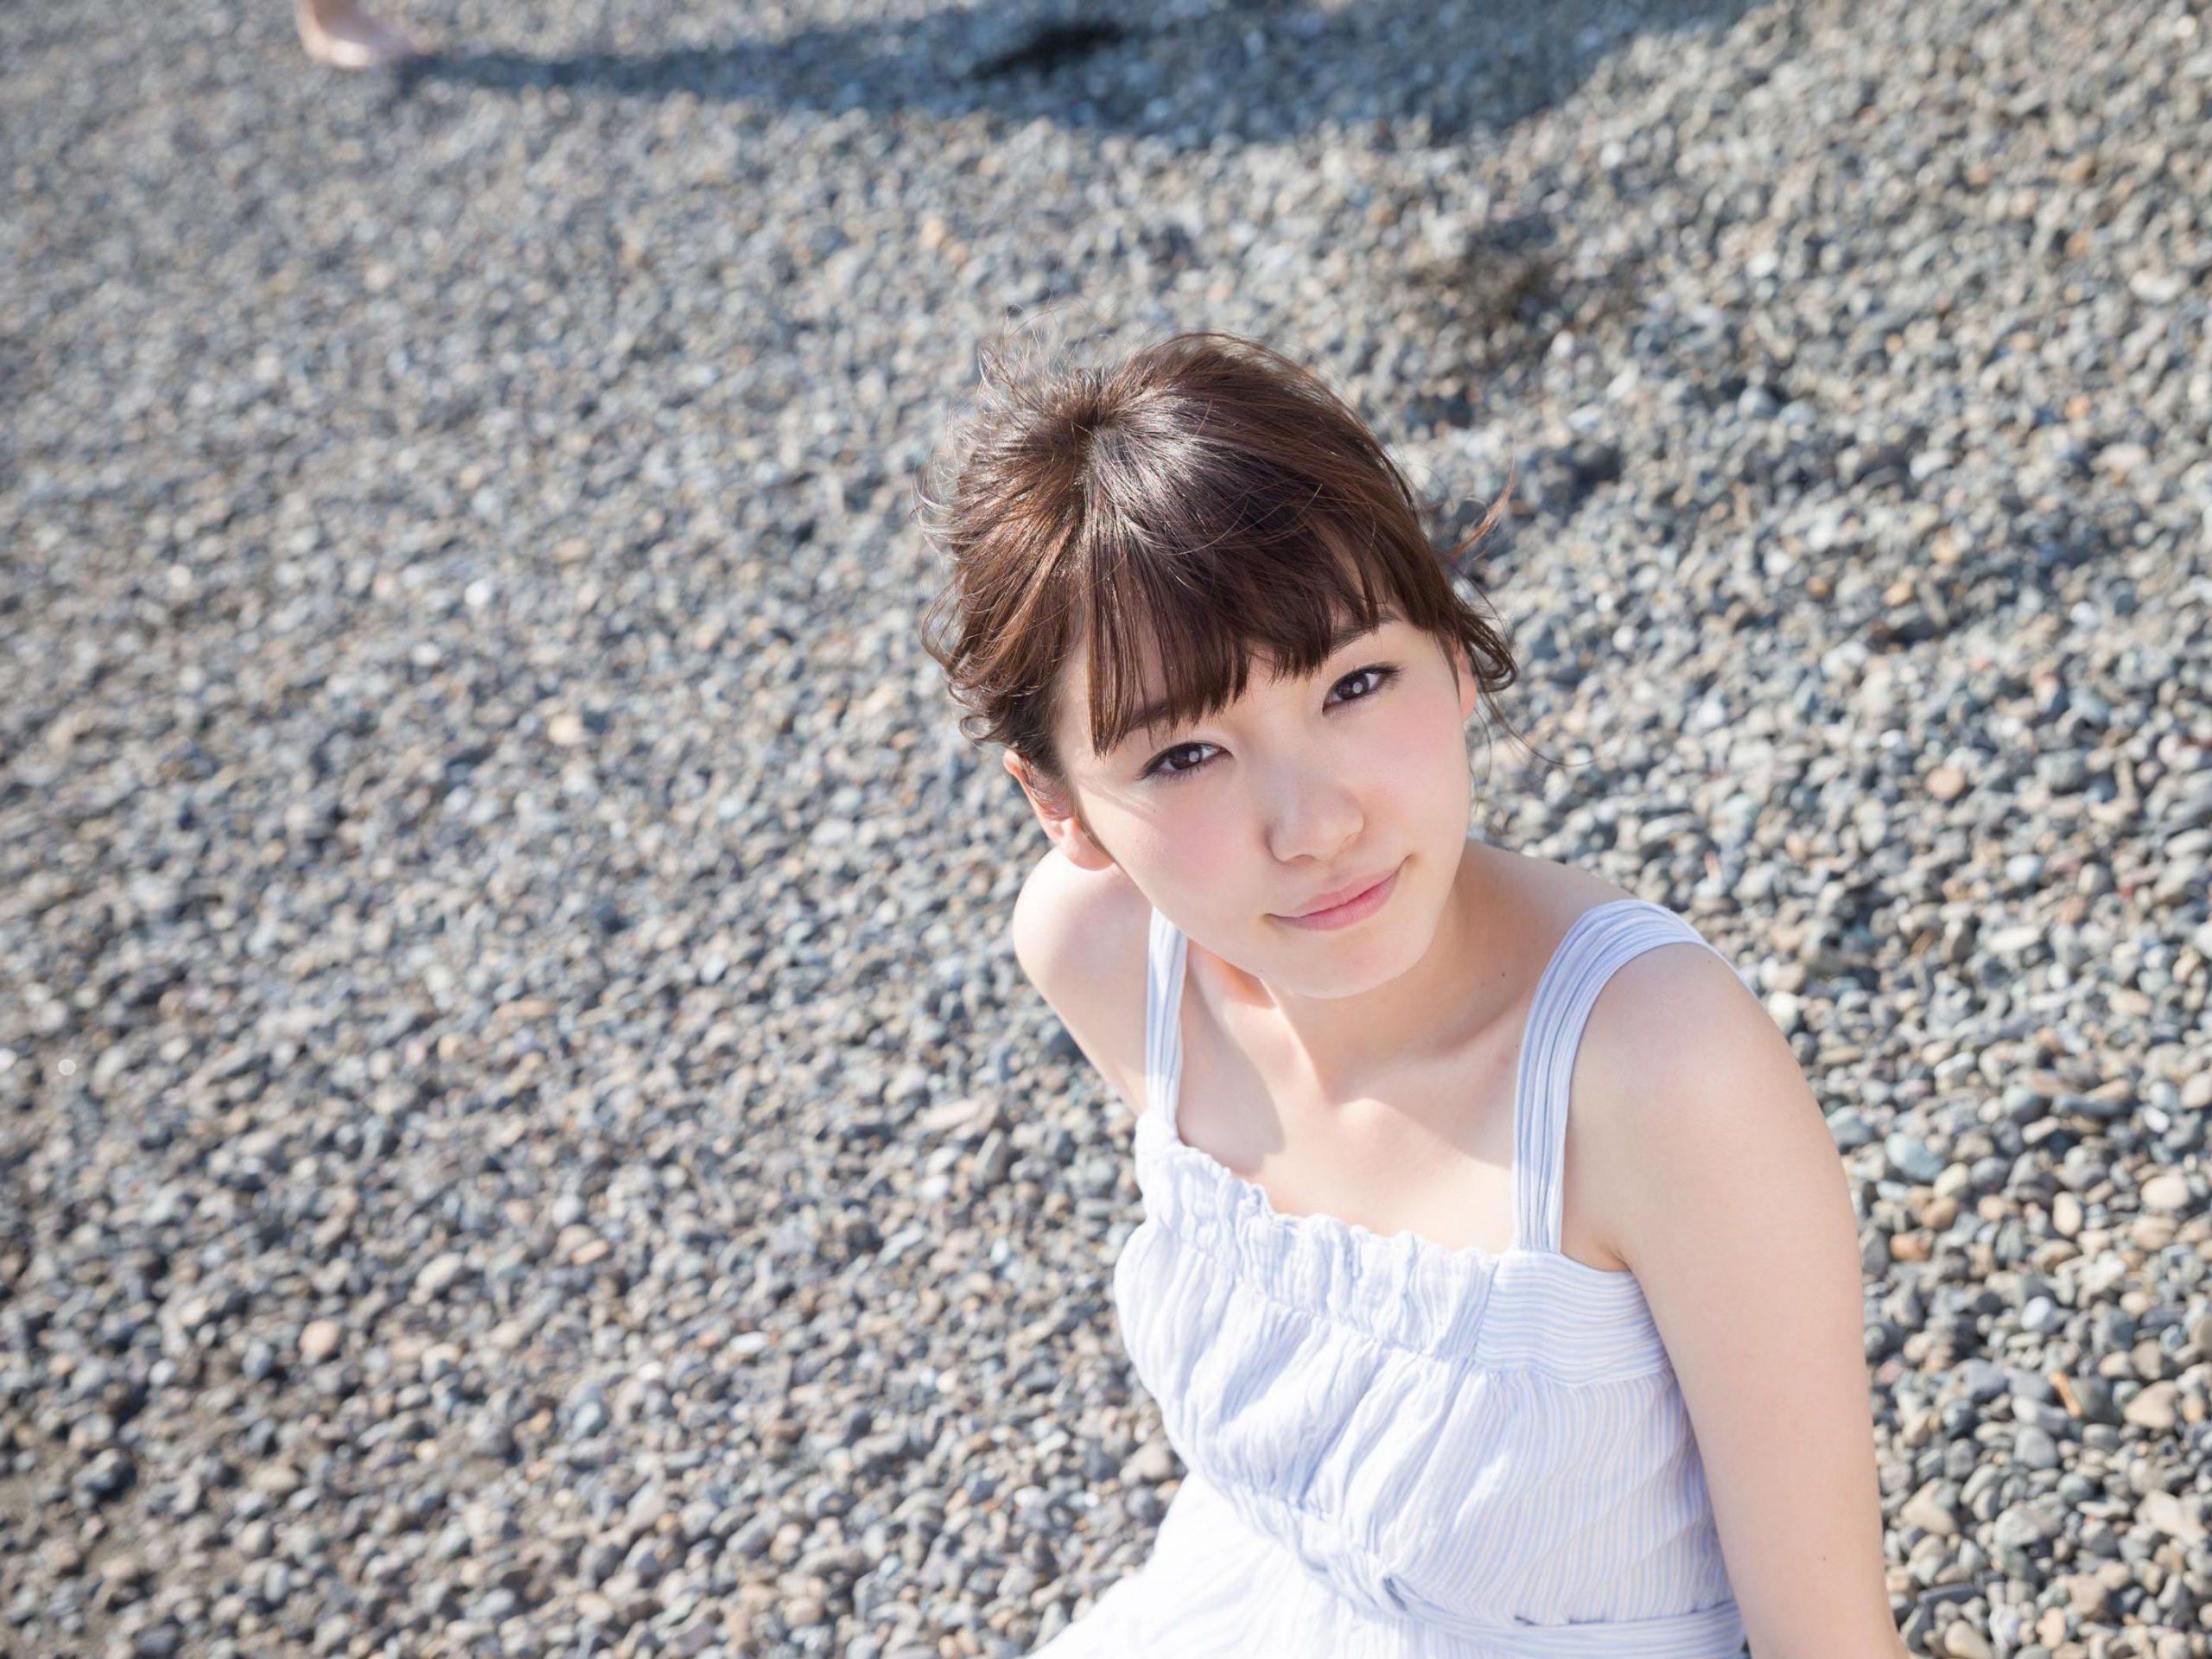 PROTO STAR 飯豊まりえ vol.4 52photos